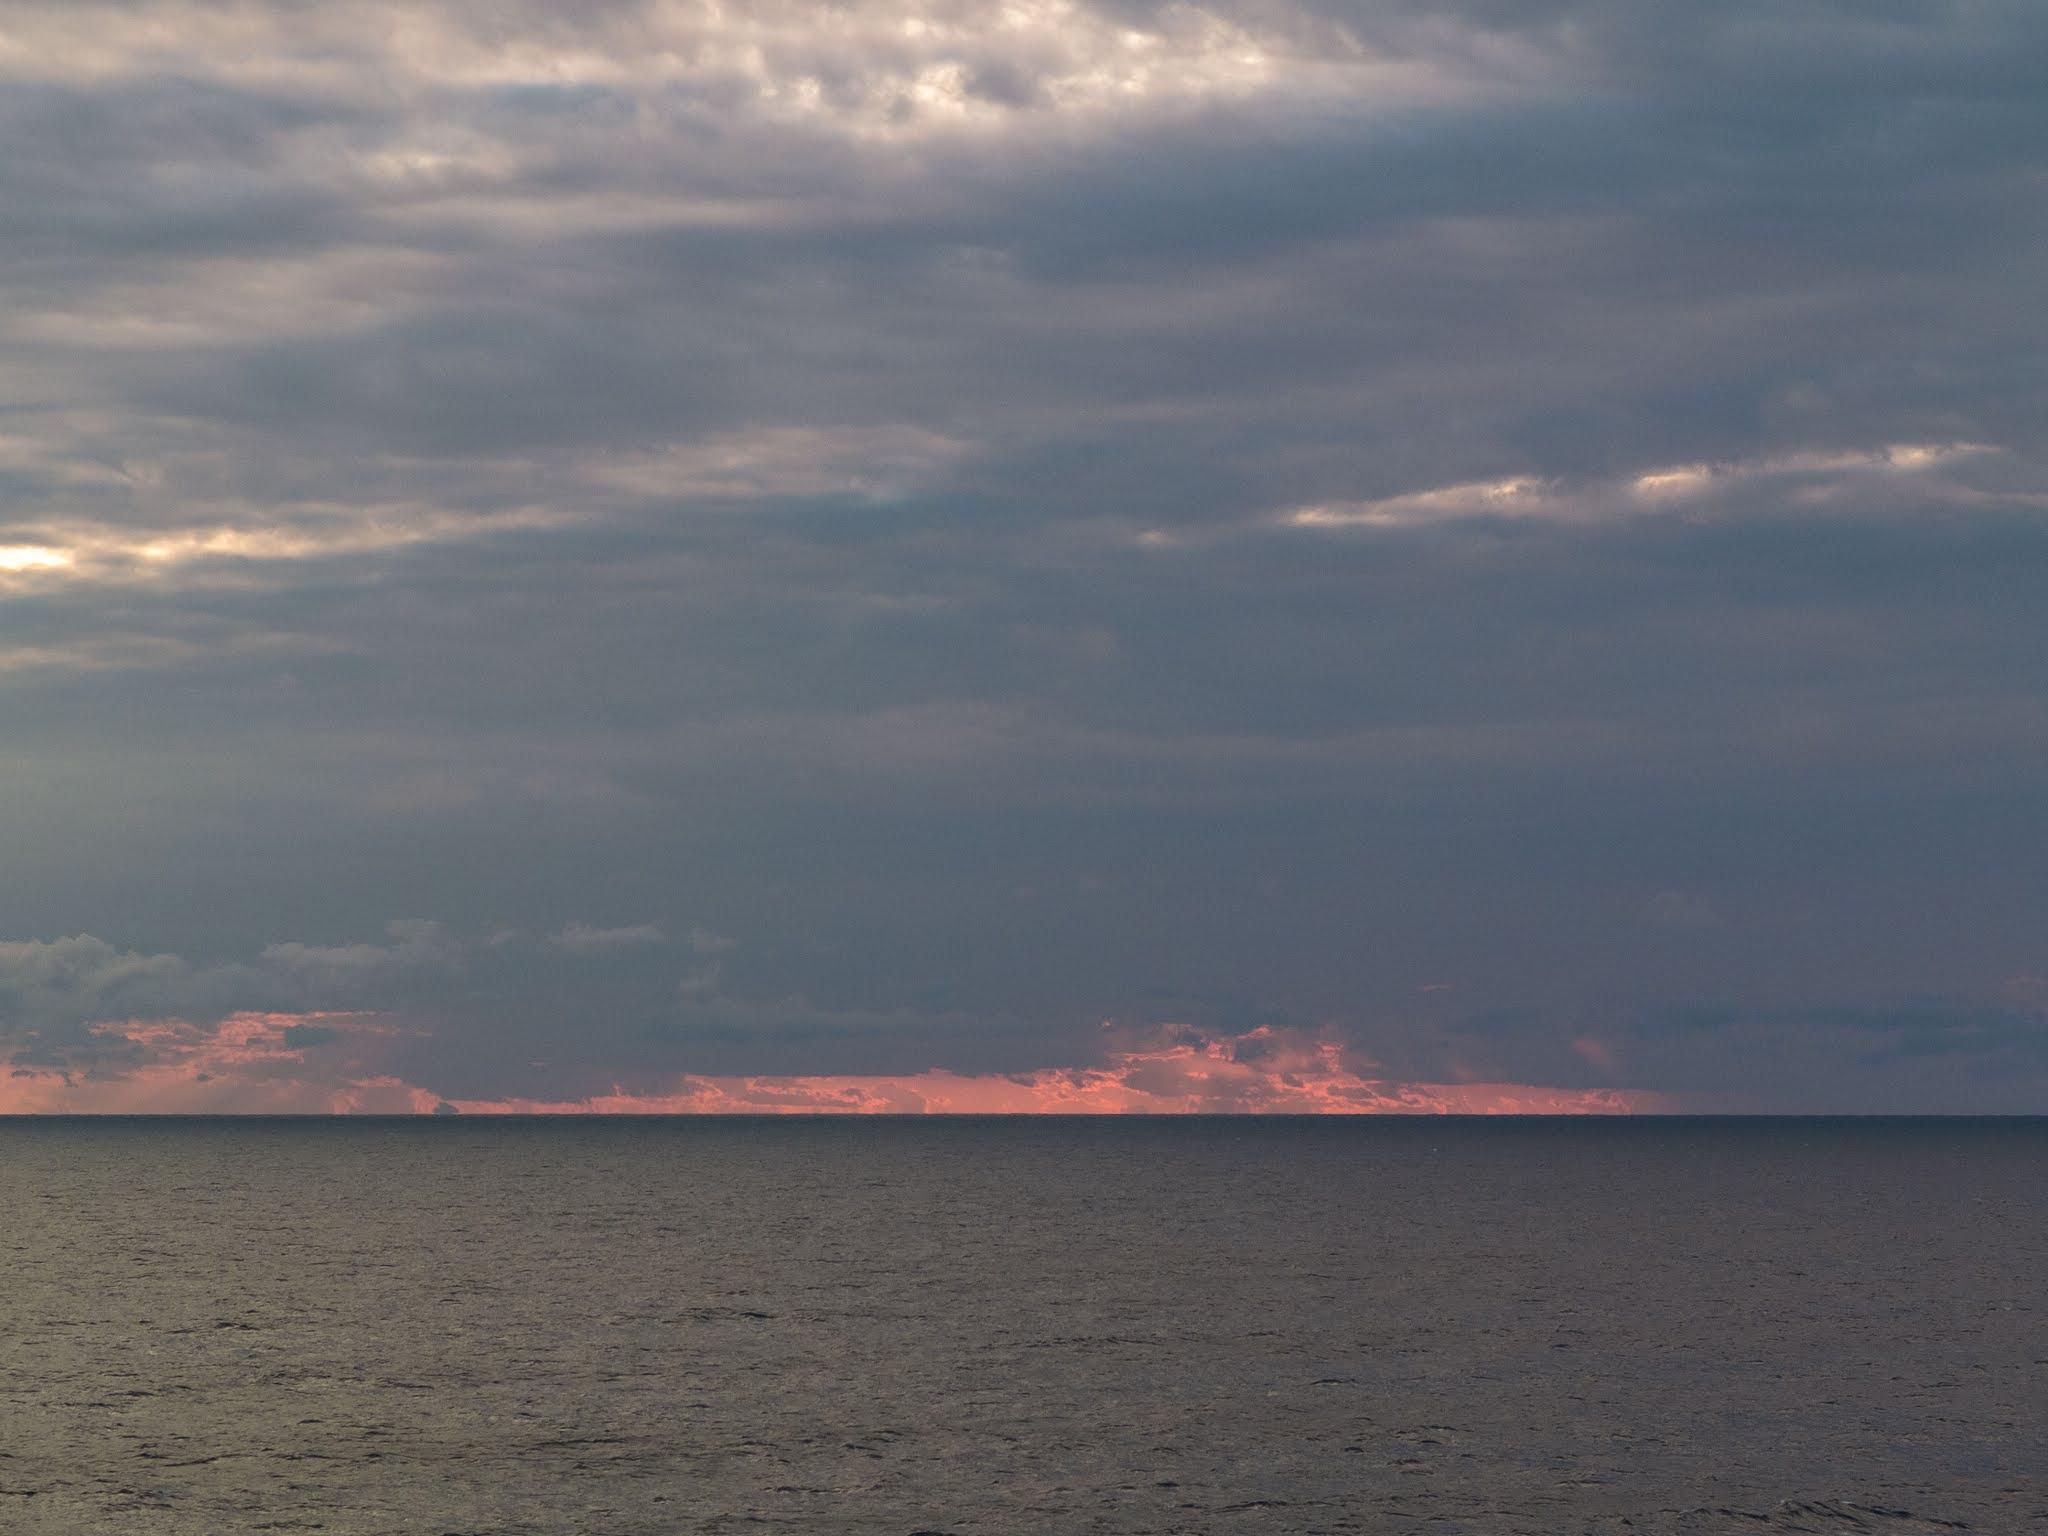 Sunset landscape of the Balearic Sea.